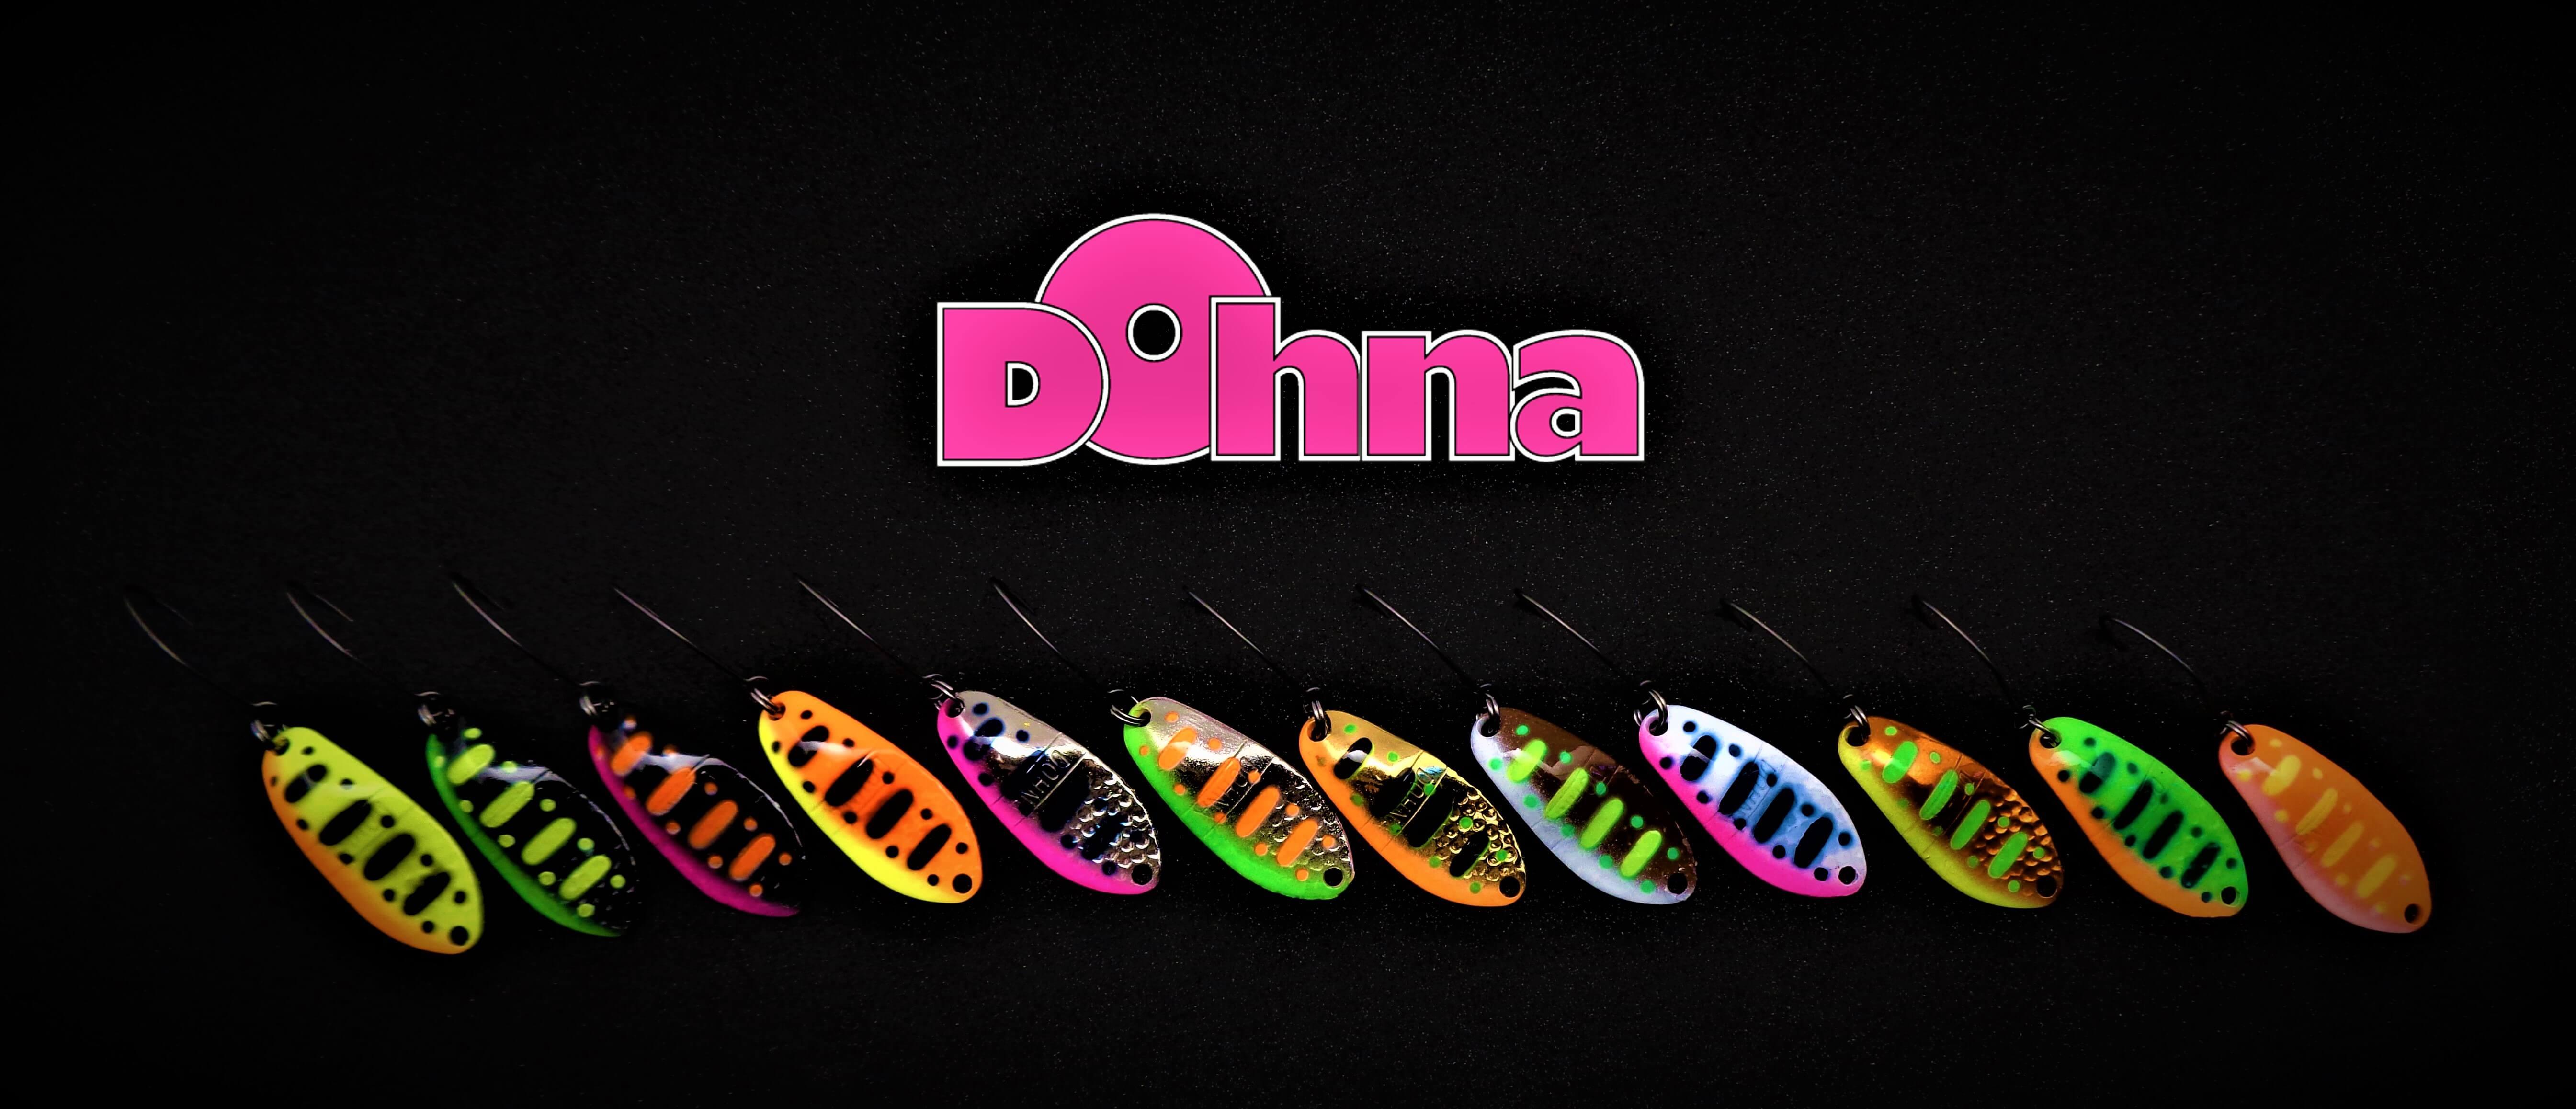 Antem Dohna Italian Colors Spoon